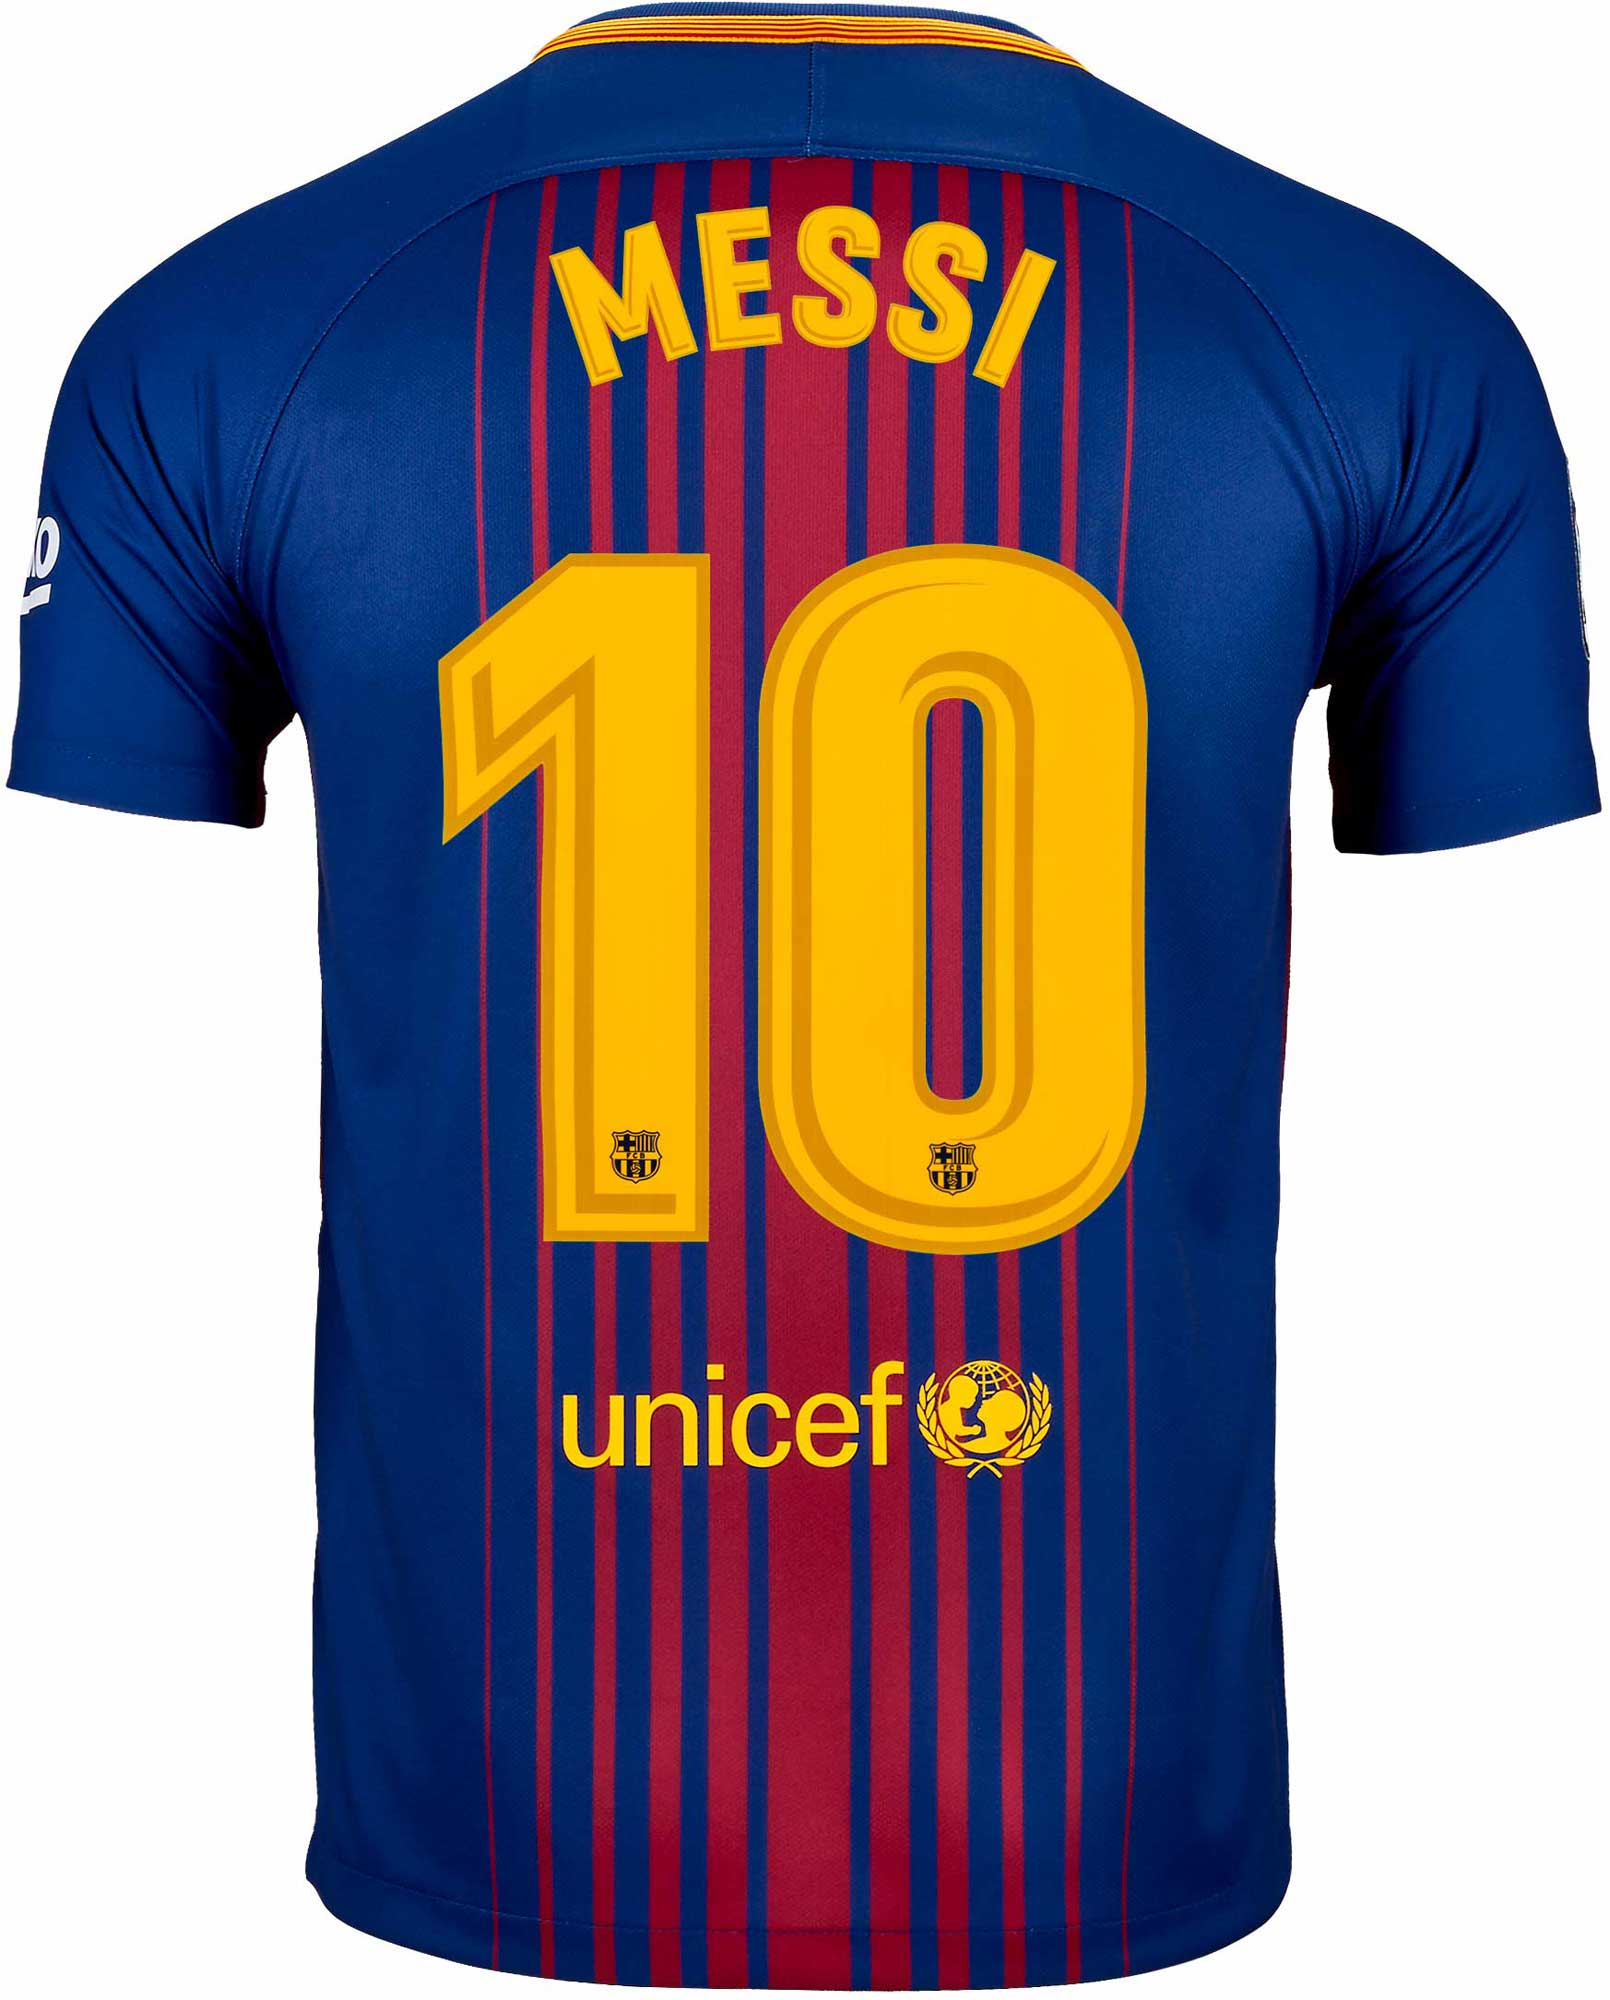 1b3da668105 Nike Kids Lionel Messi Barcelona Home Jersey 2017-18